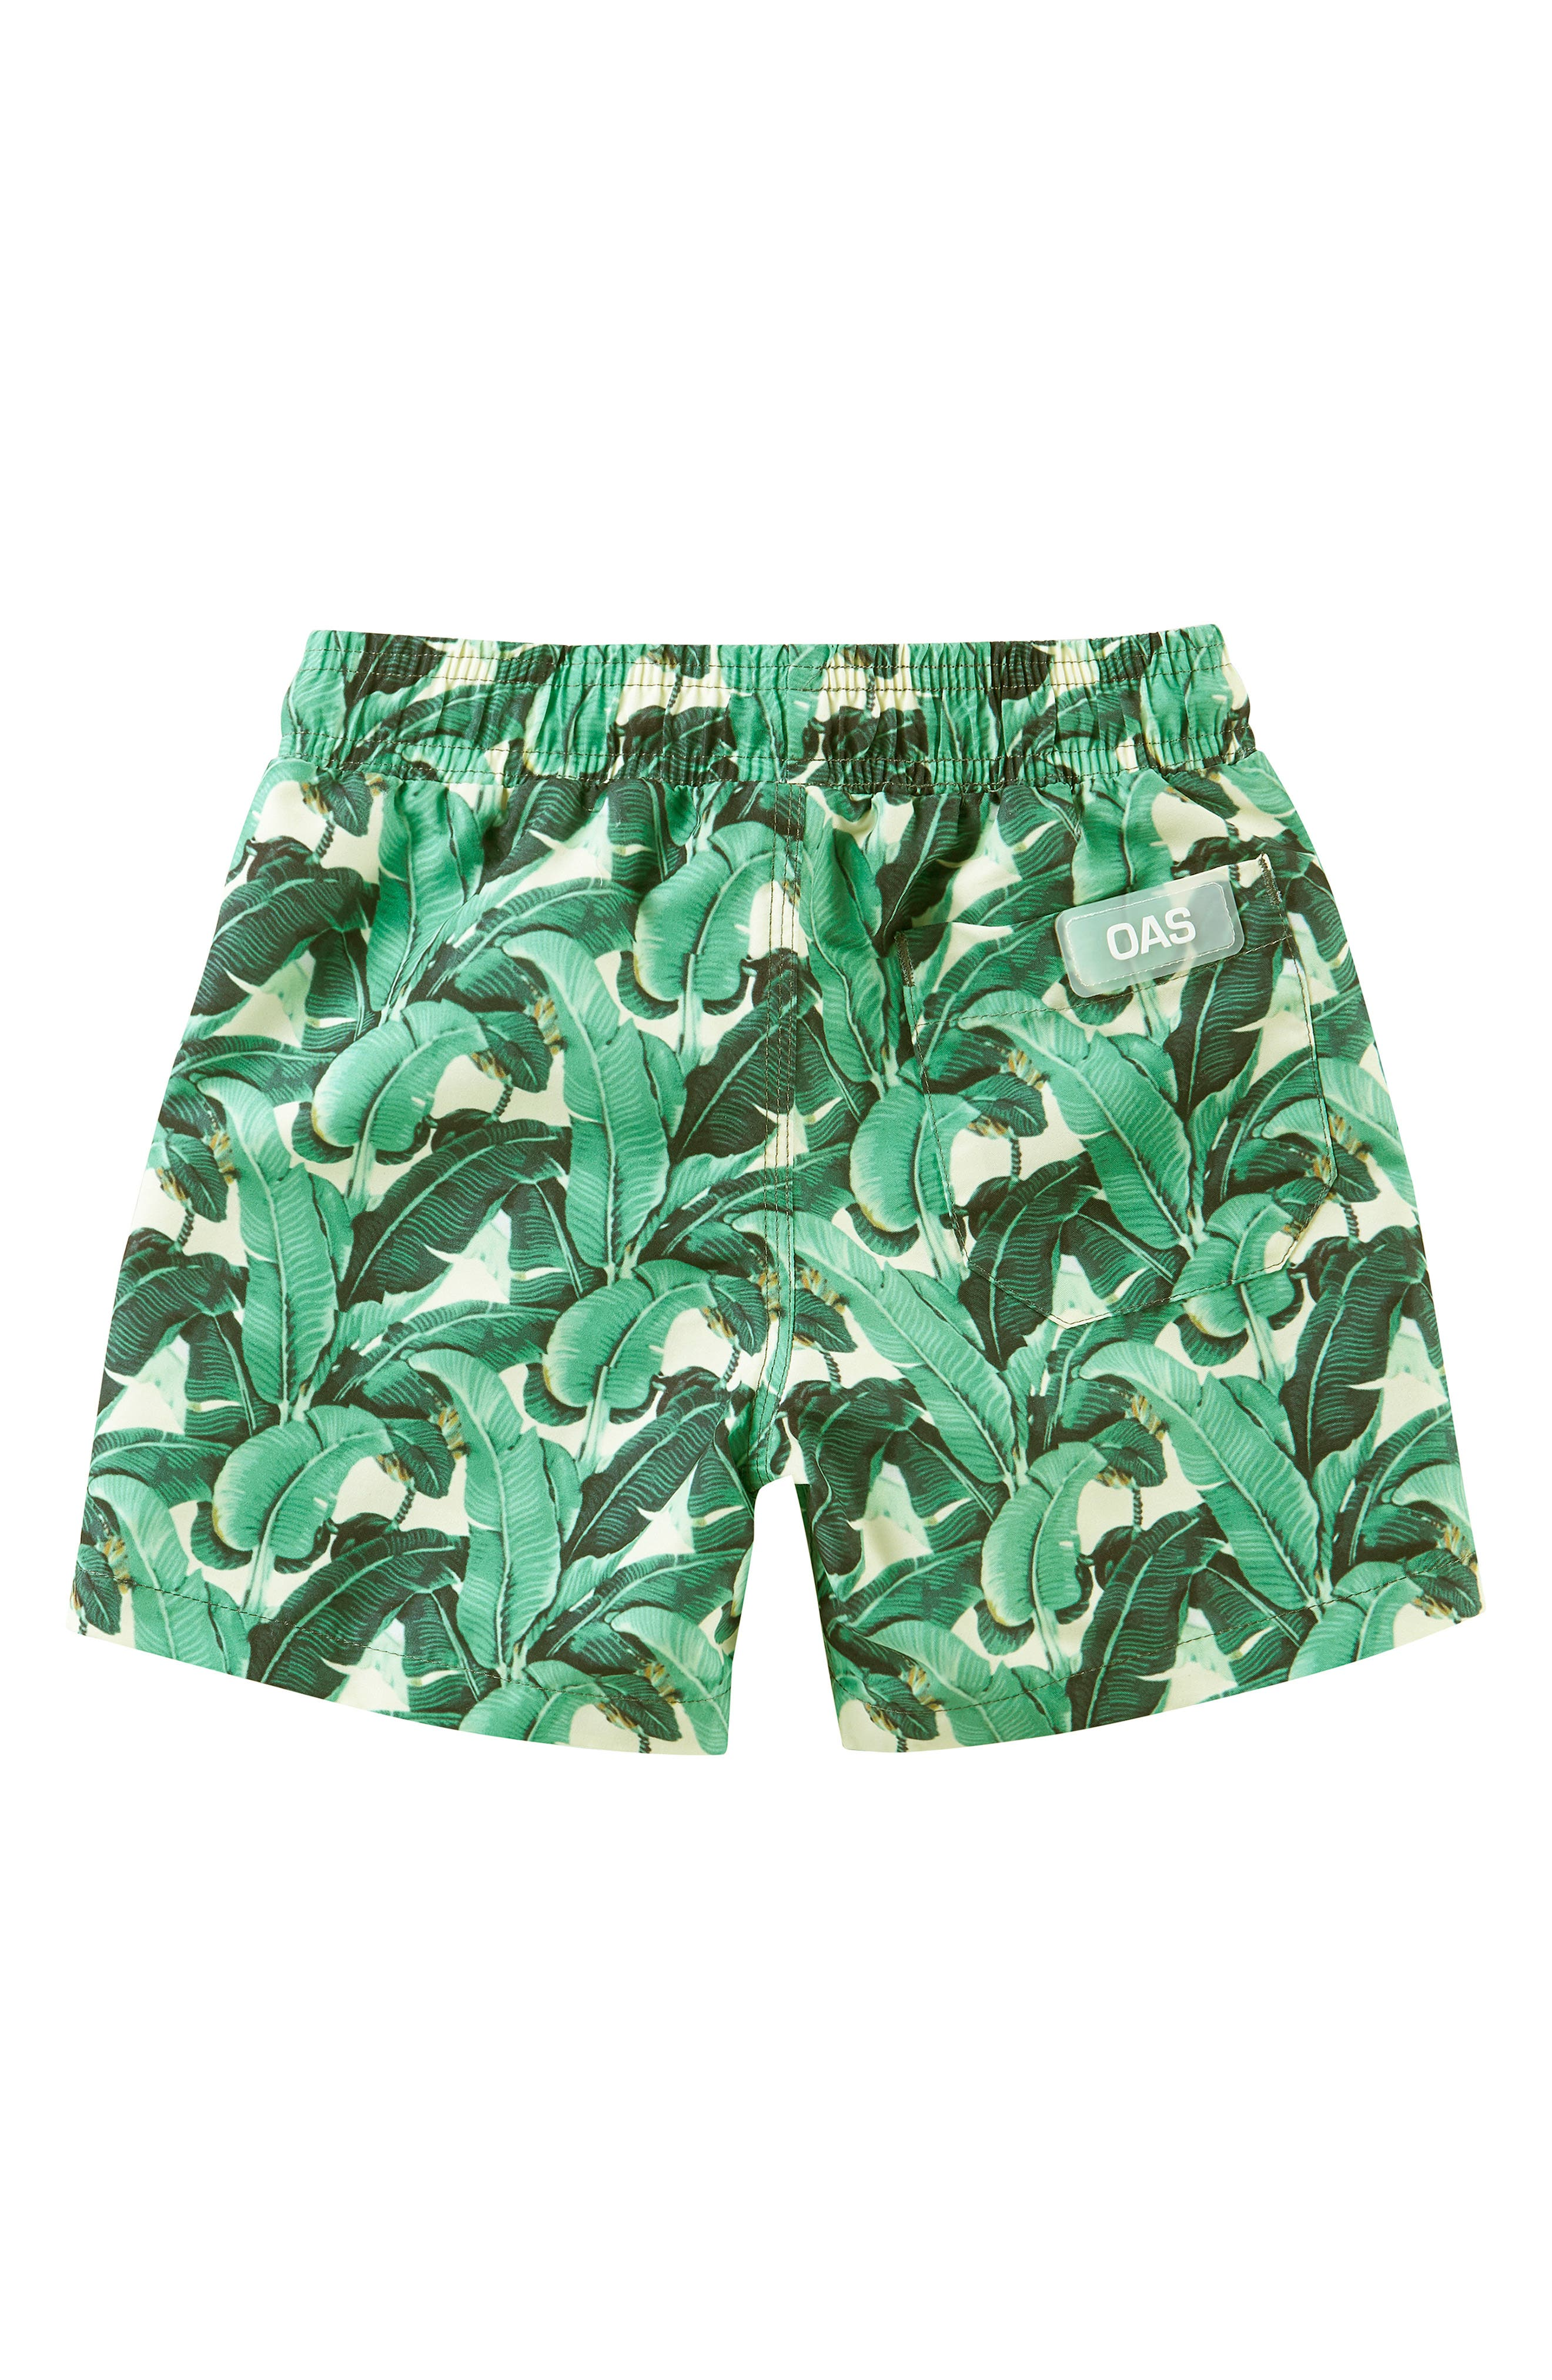 e93349caab64 Boys' OAS Swimwear, Swim Trunks & Rashguards   Nordstrom